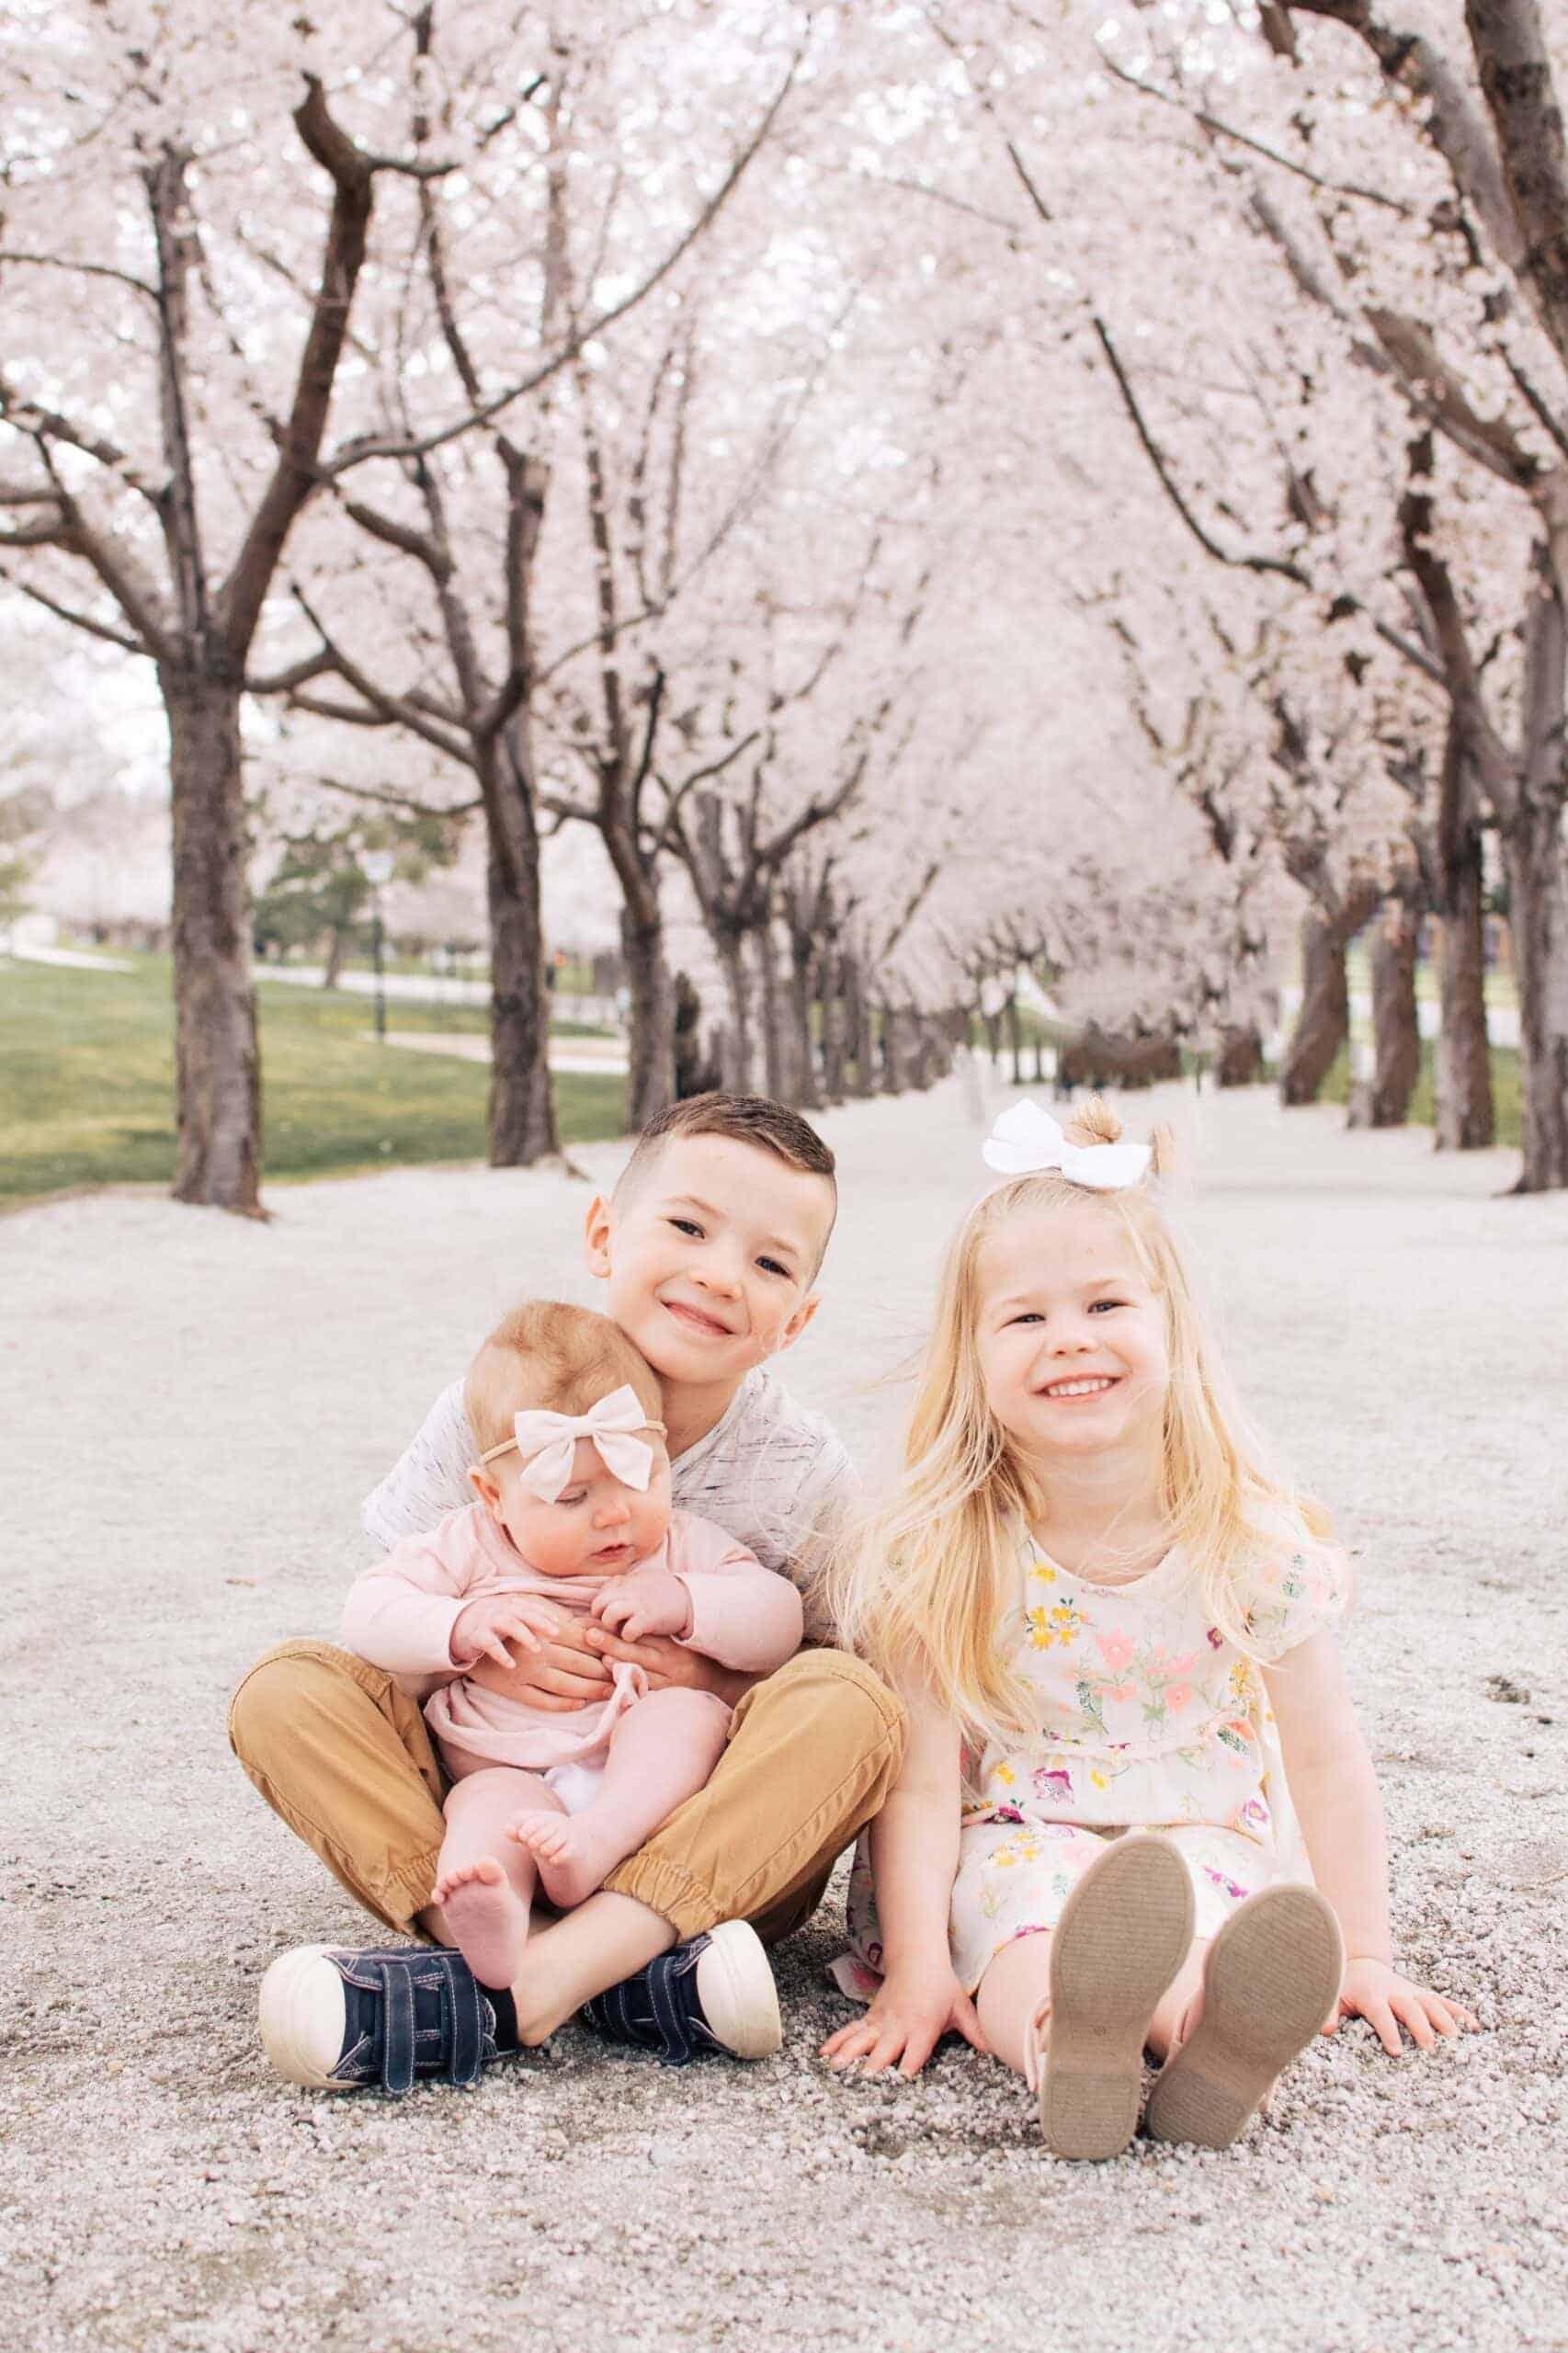 Kids smile for spring family photos.